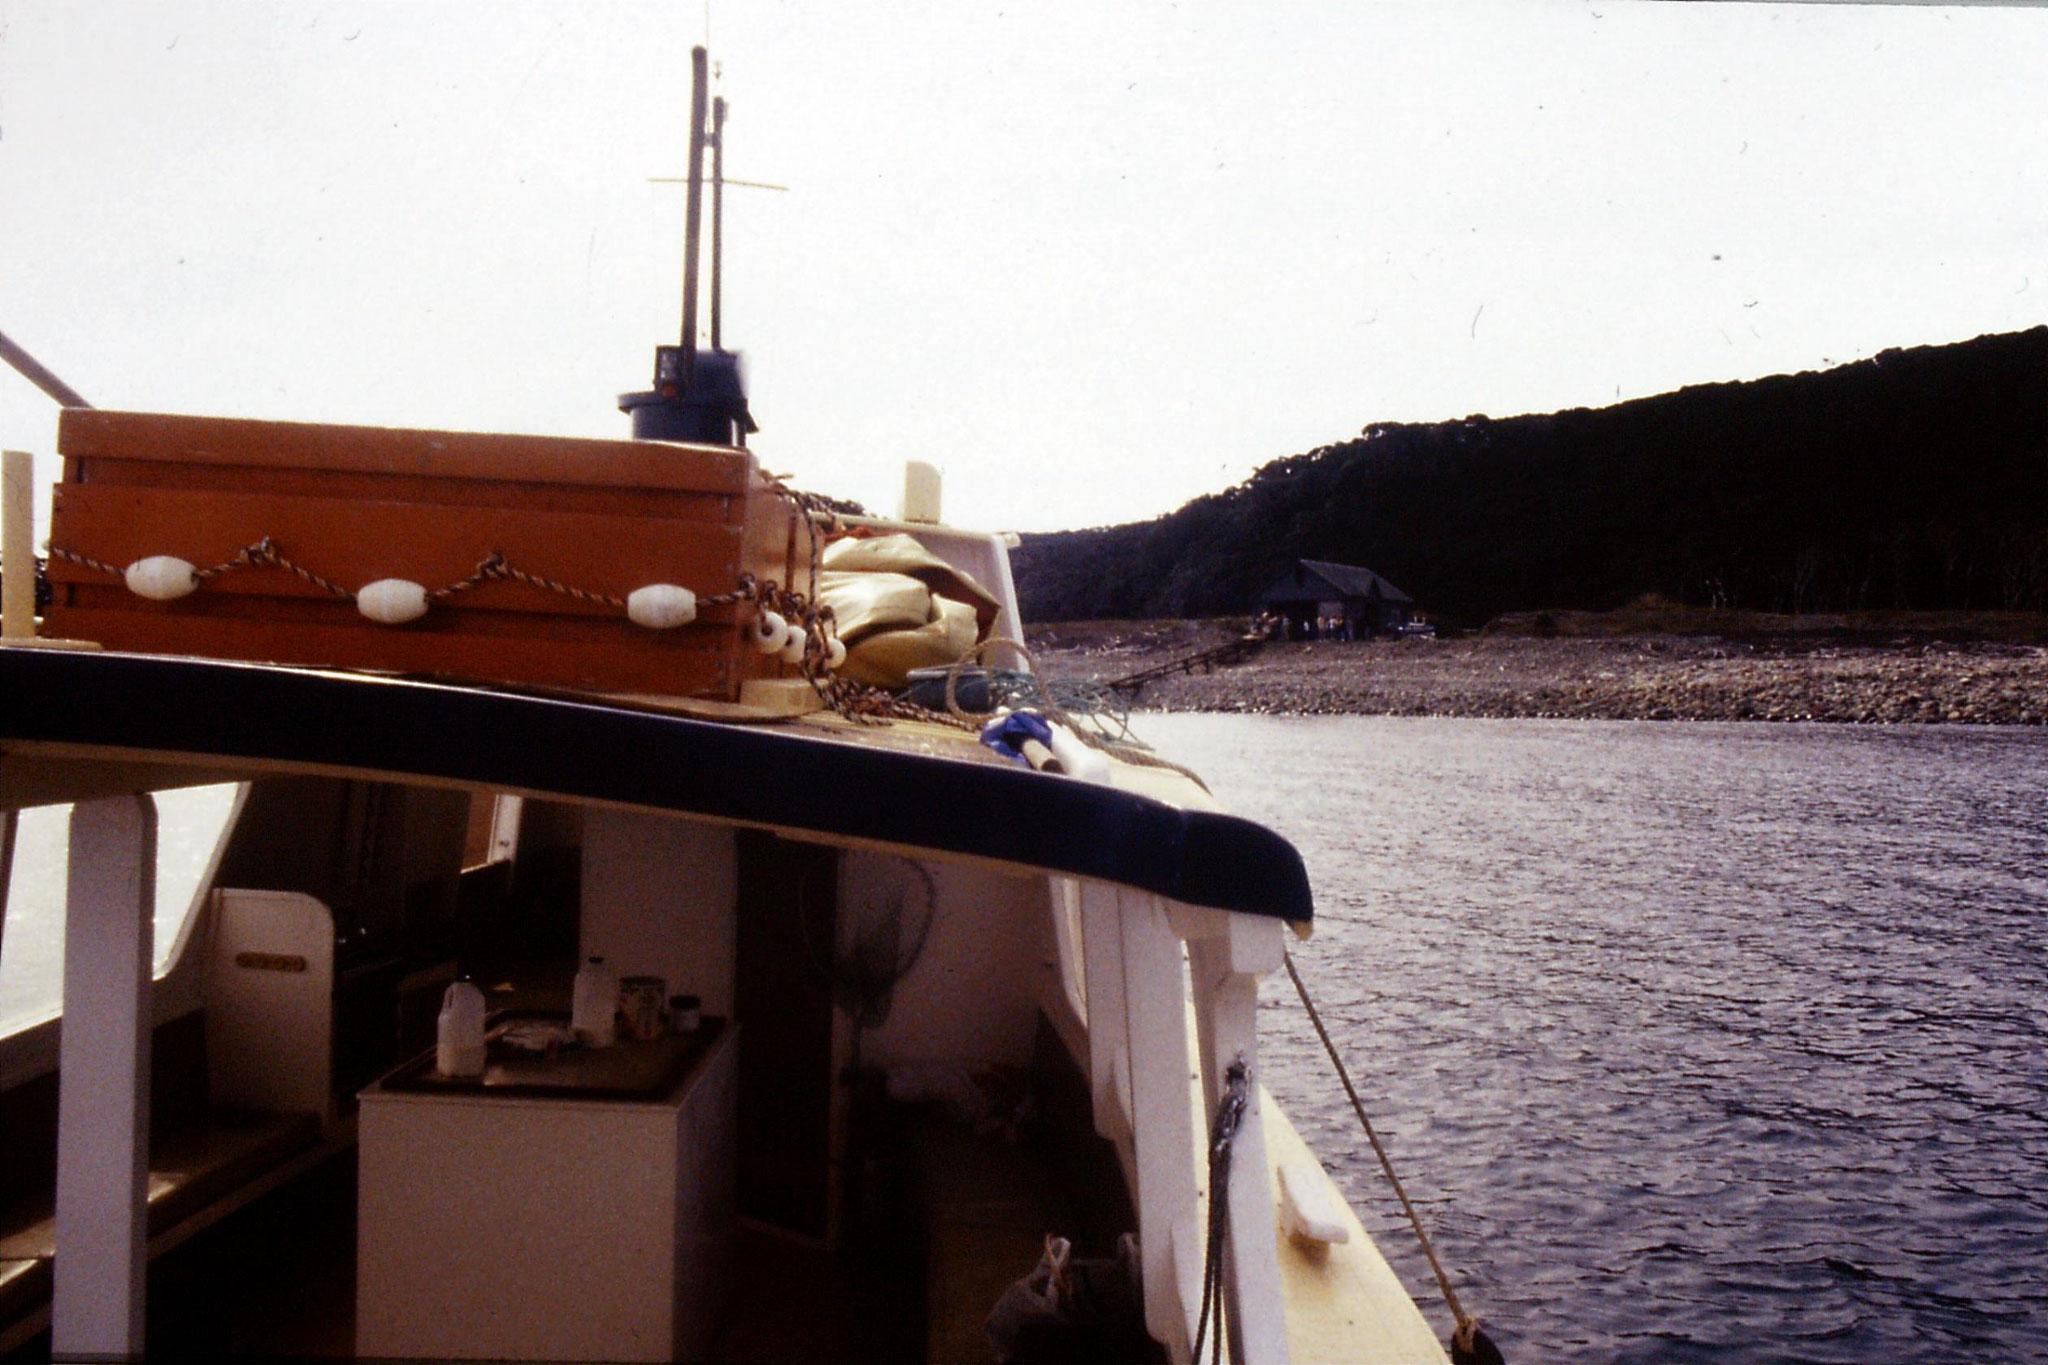 2/9/1990: 14: boat from Little Barrier Is